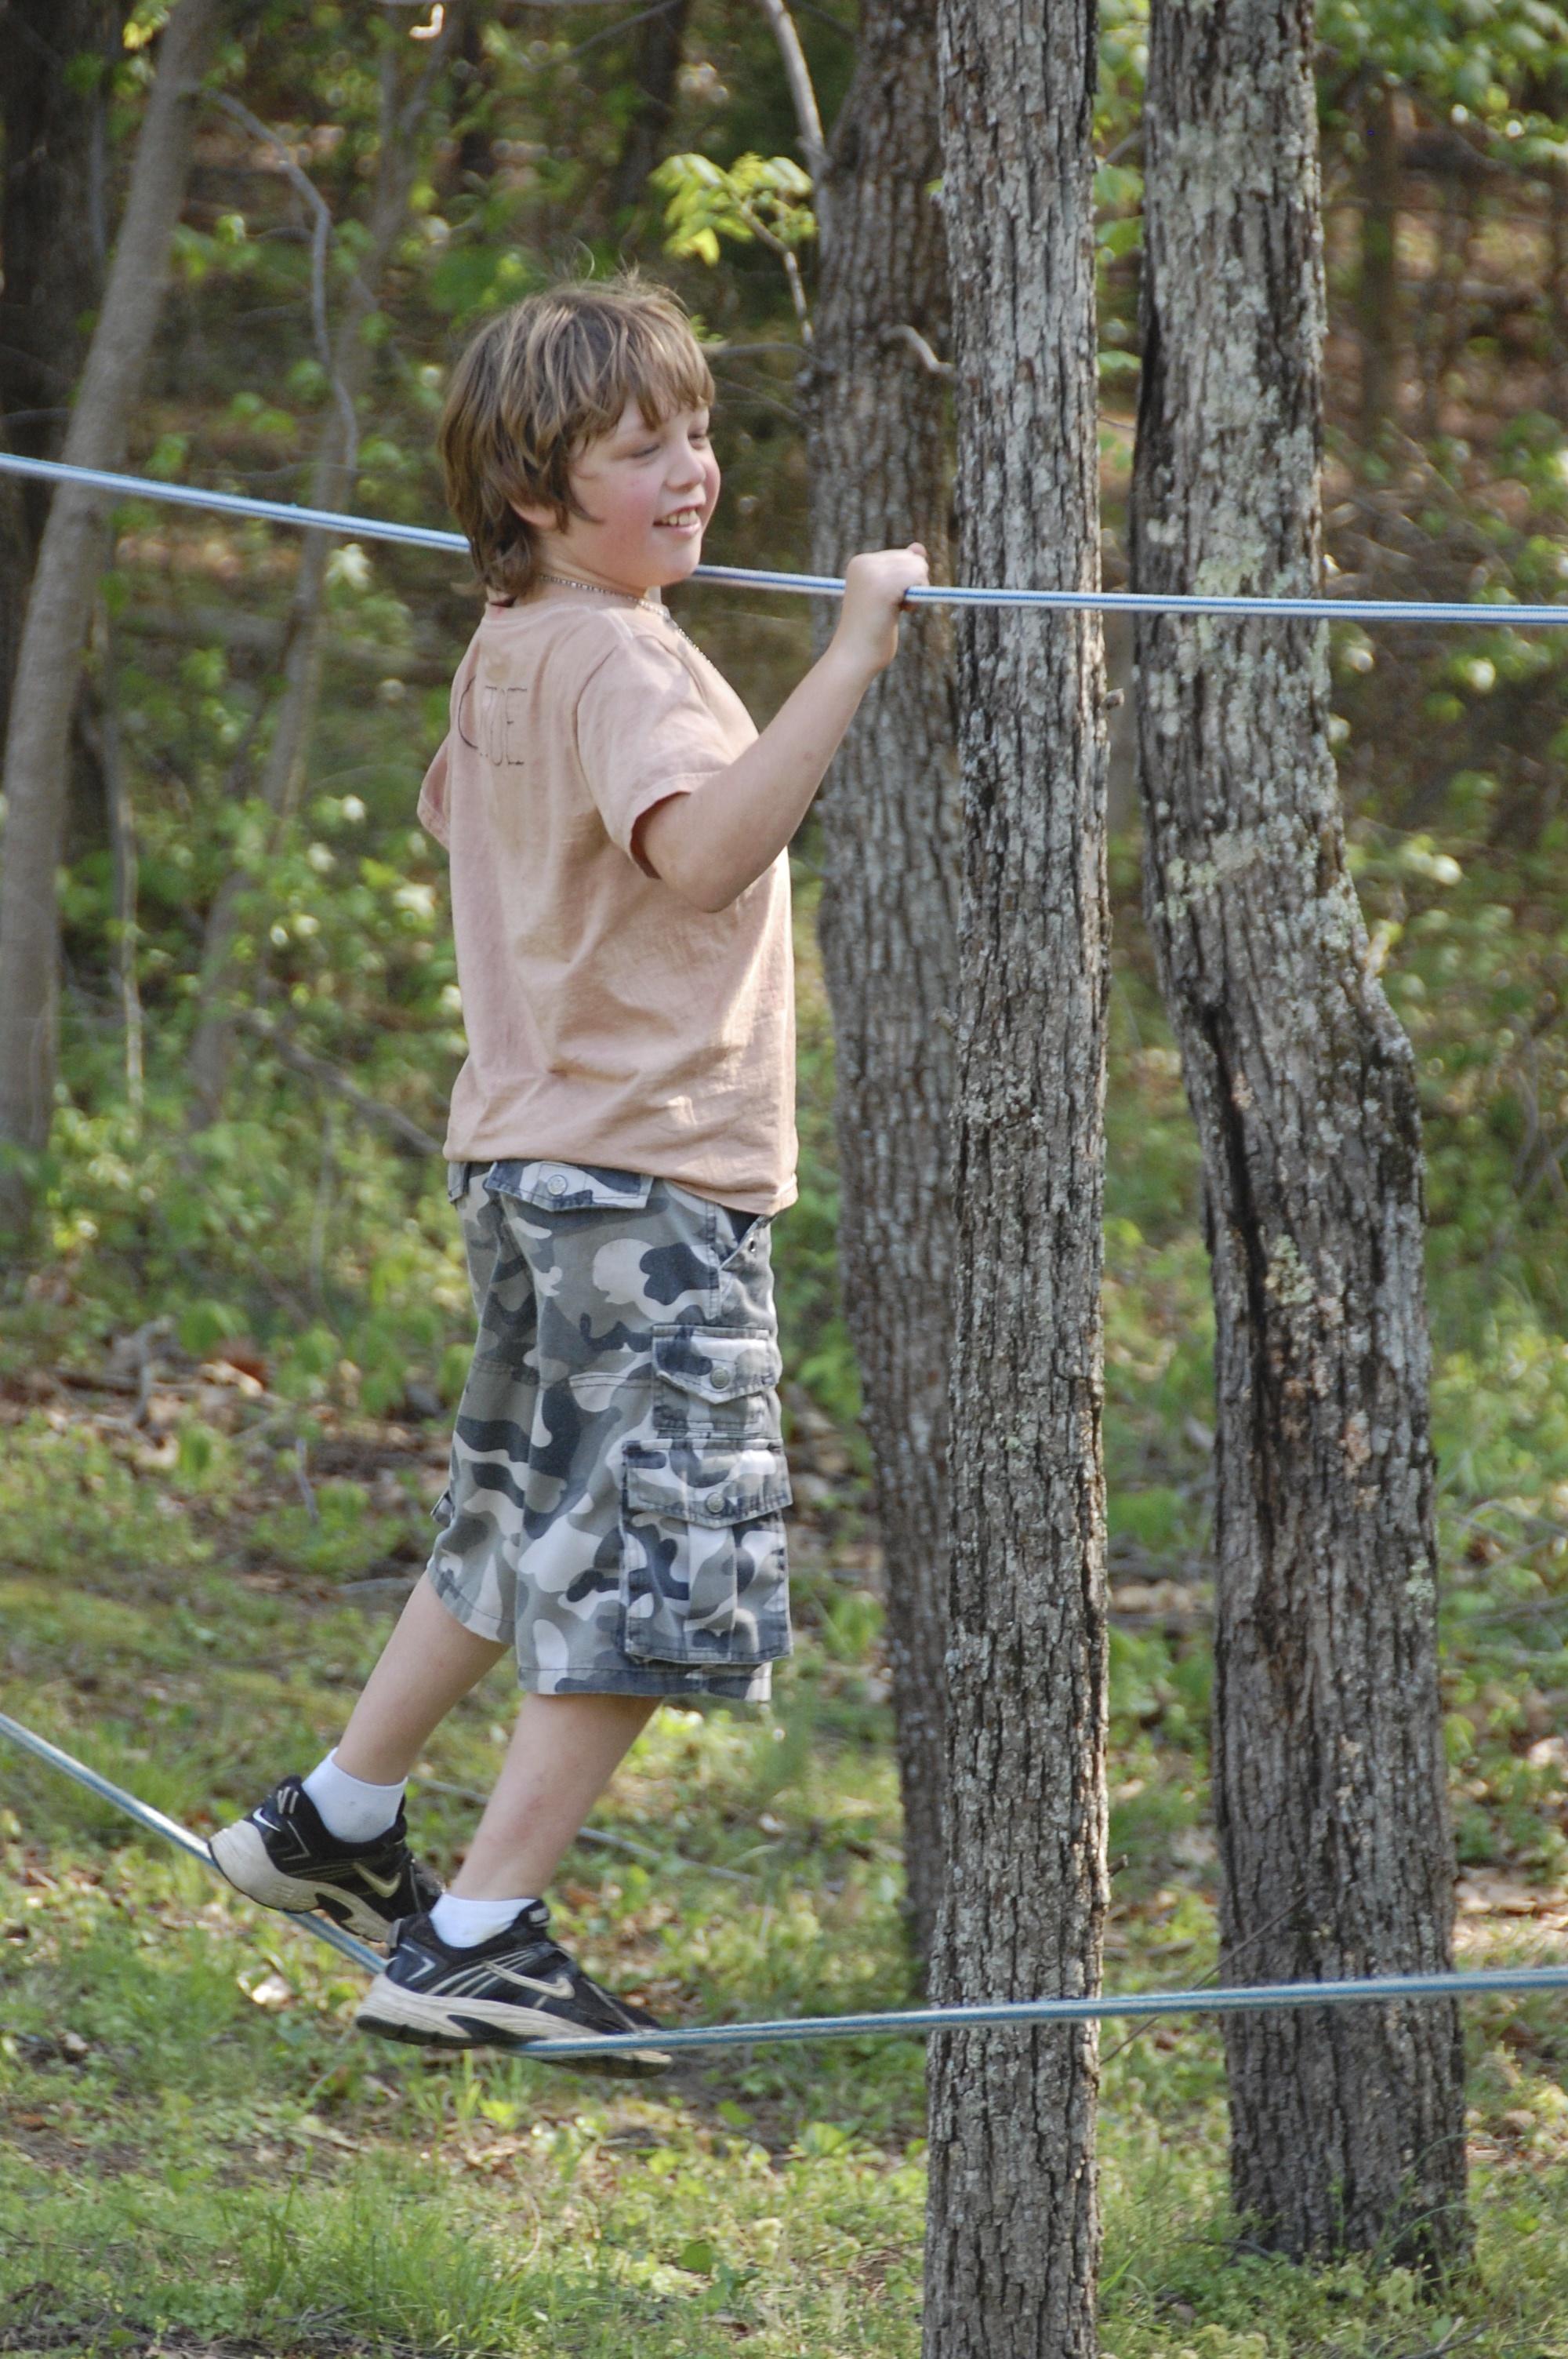 Birthday boy Burke crossing the ropes